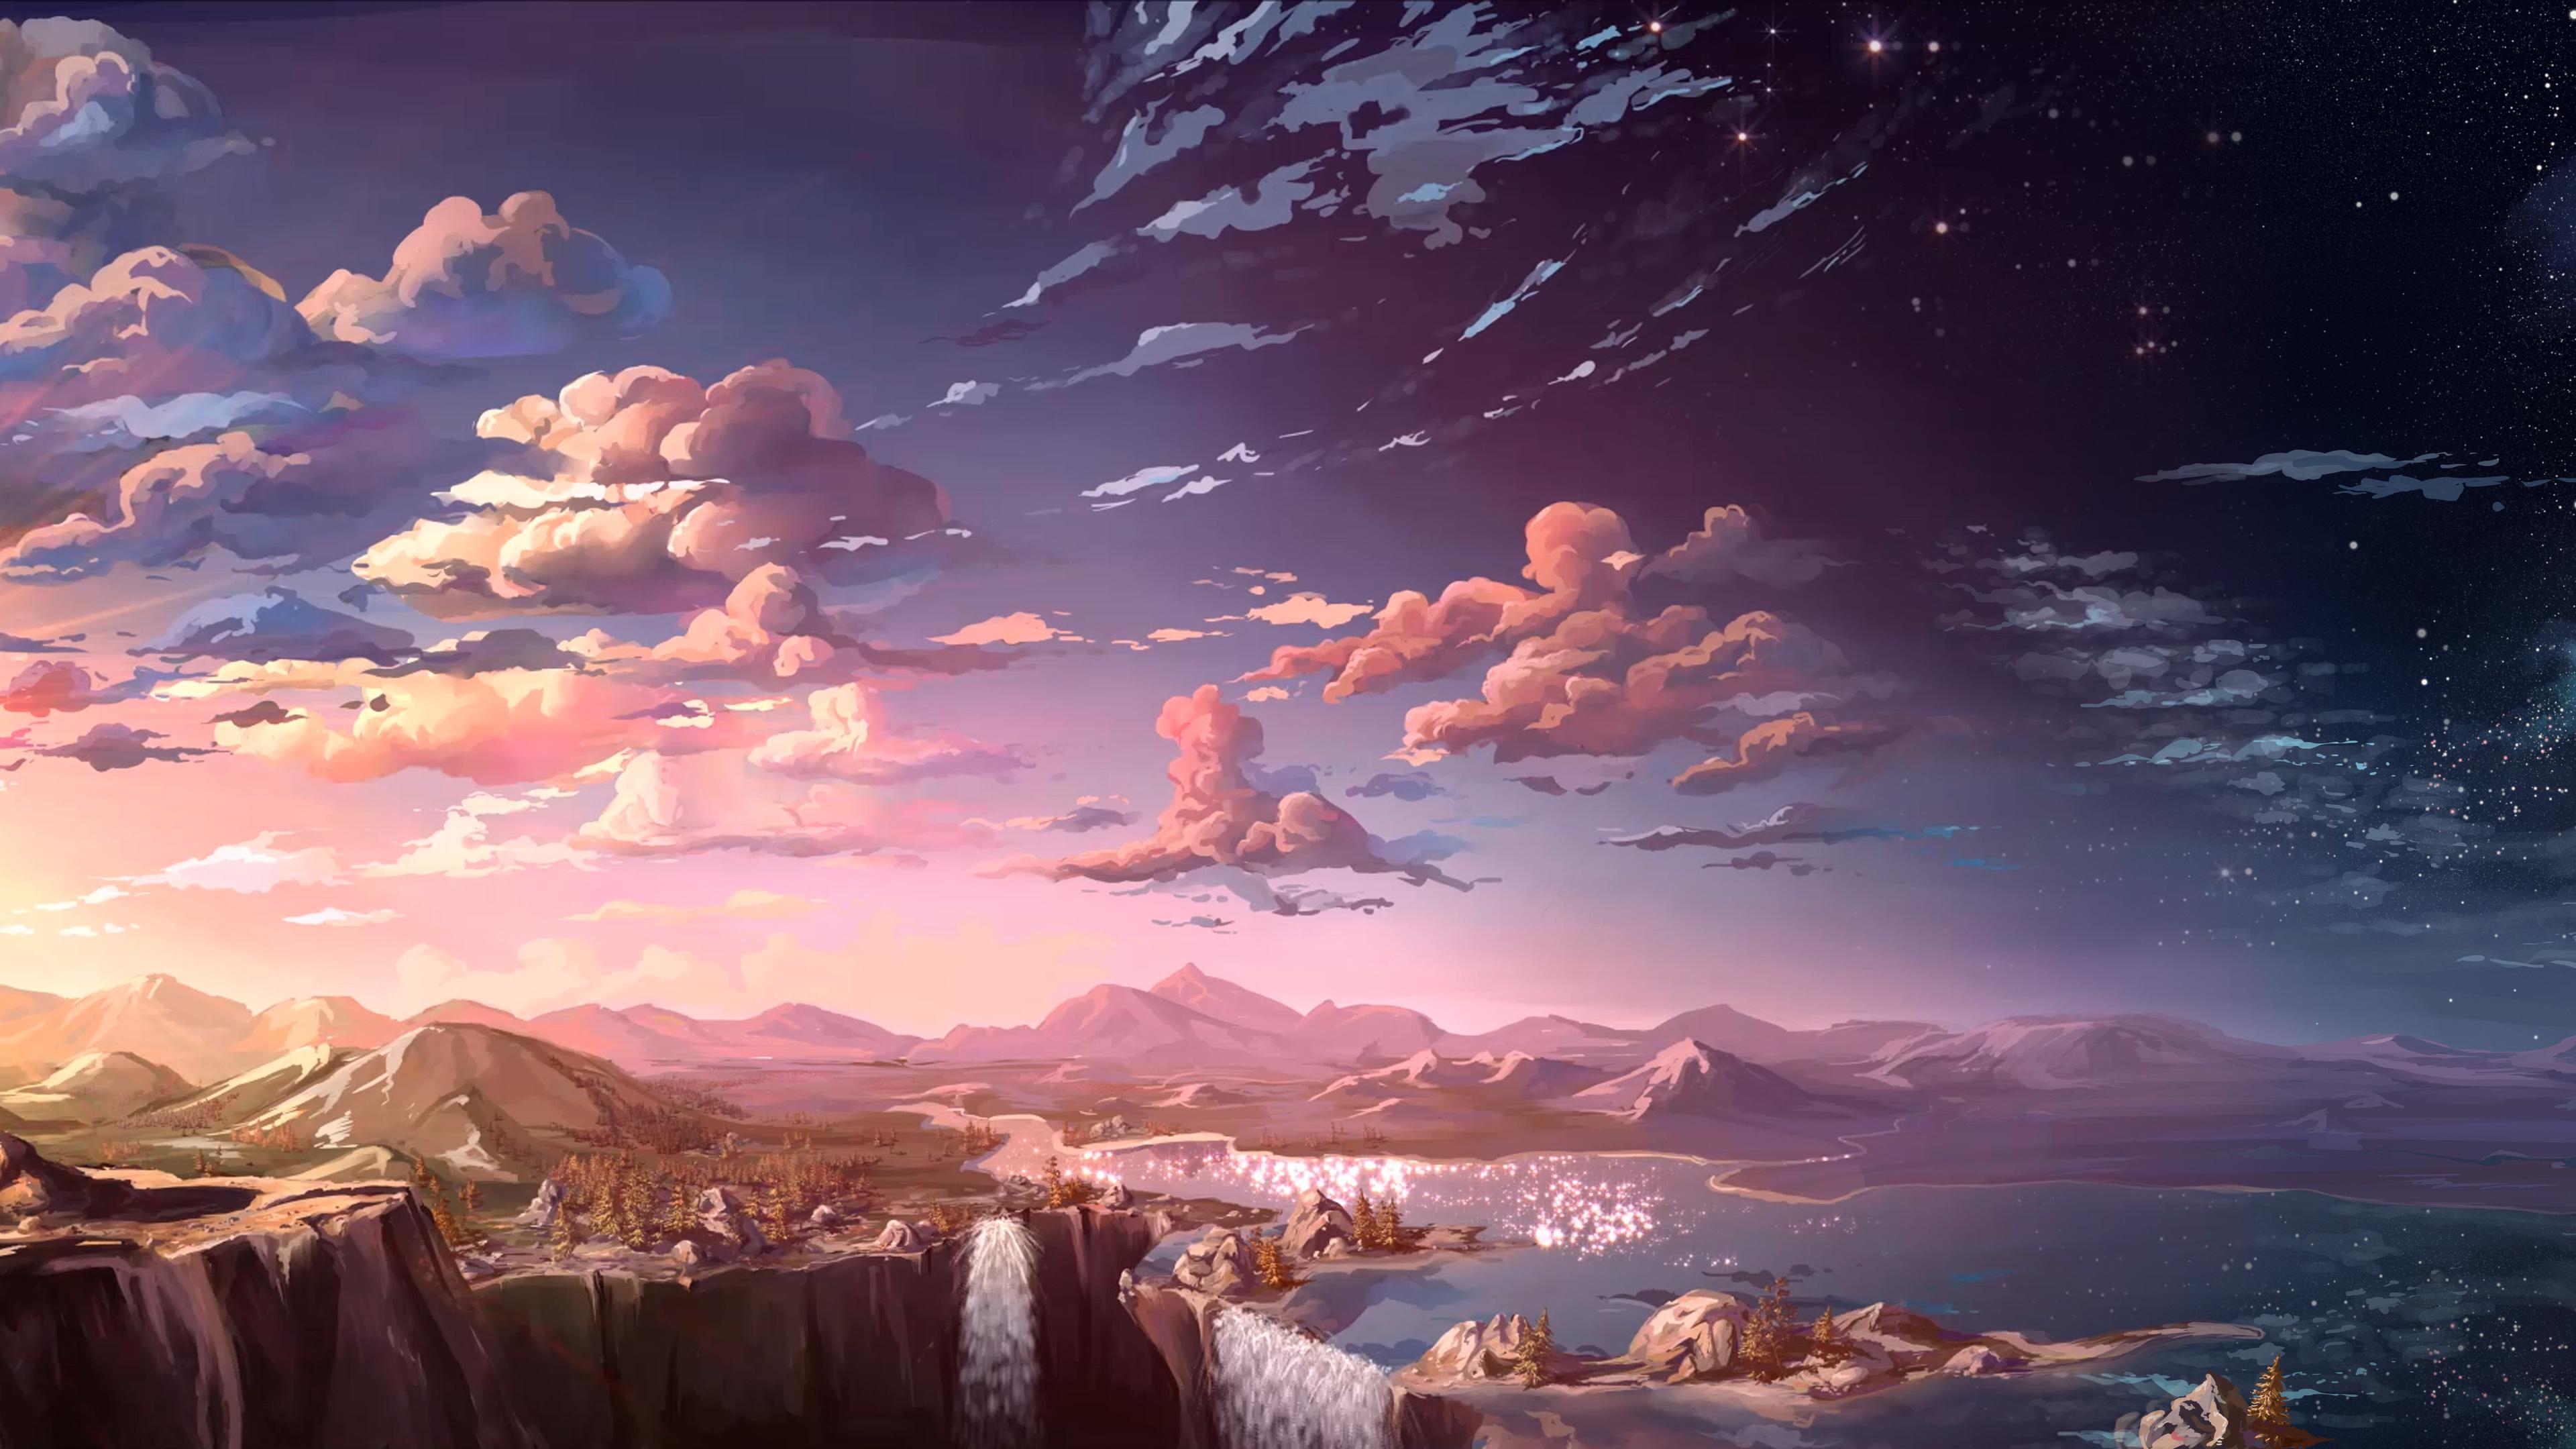 waterfall sunset landscape artist 4k 1540751476 - Waterfall Sunset Landscape Artist 4k - waterfall wallpapers, sunset wallpapers, landscape wallpapers, hd-wallpapers, digital art wallpapers, artwork wallpapers, artist wallpapers, 5k wallpapers, 4k-wallpapers